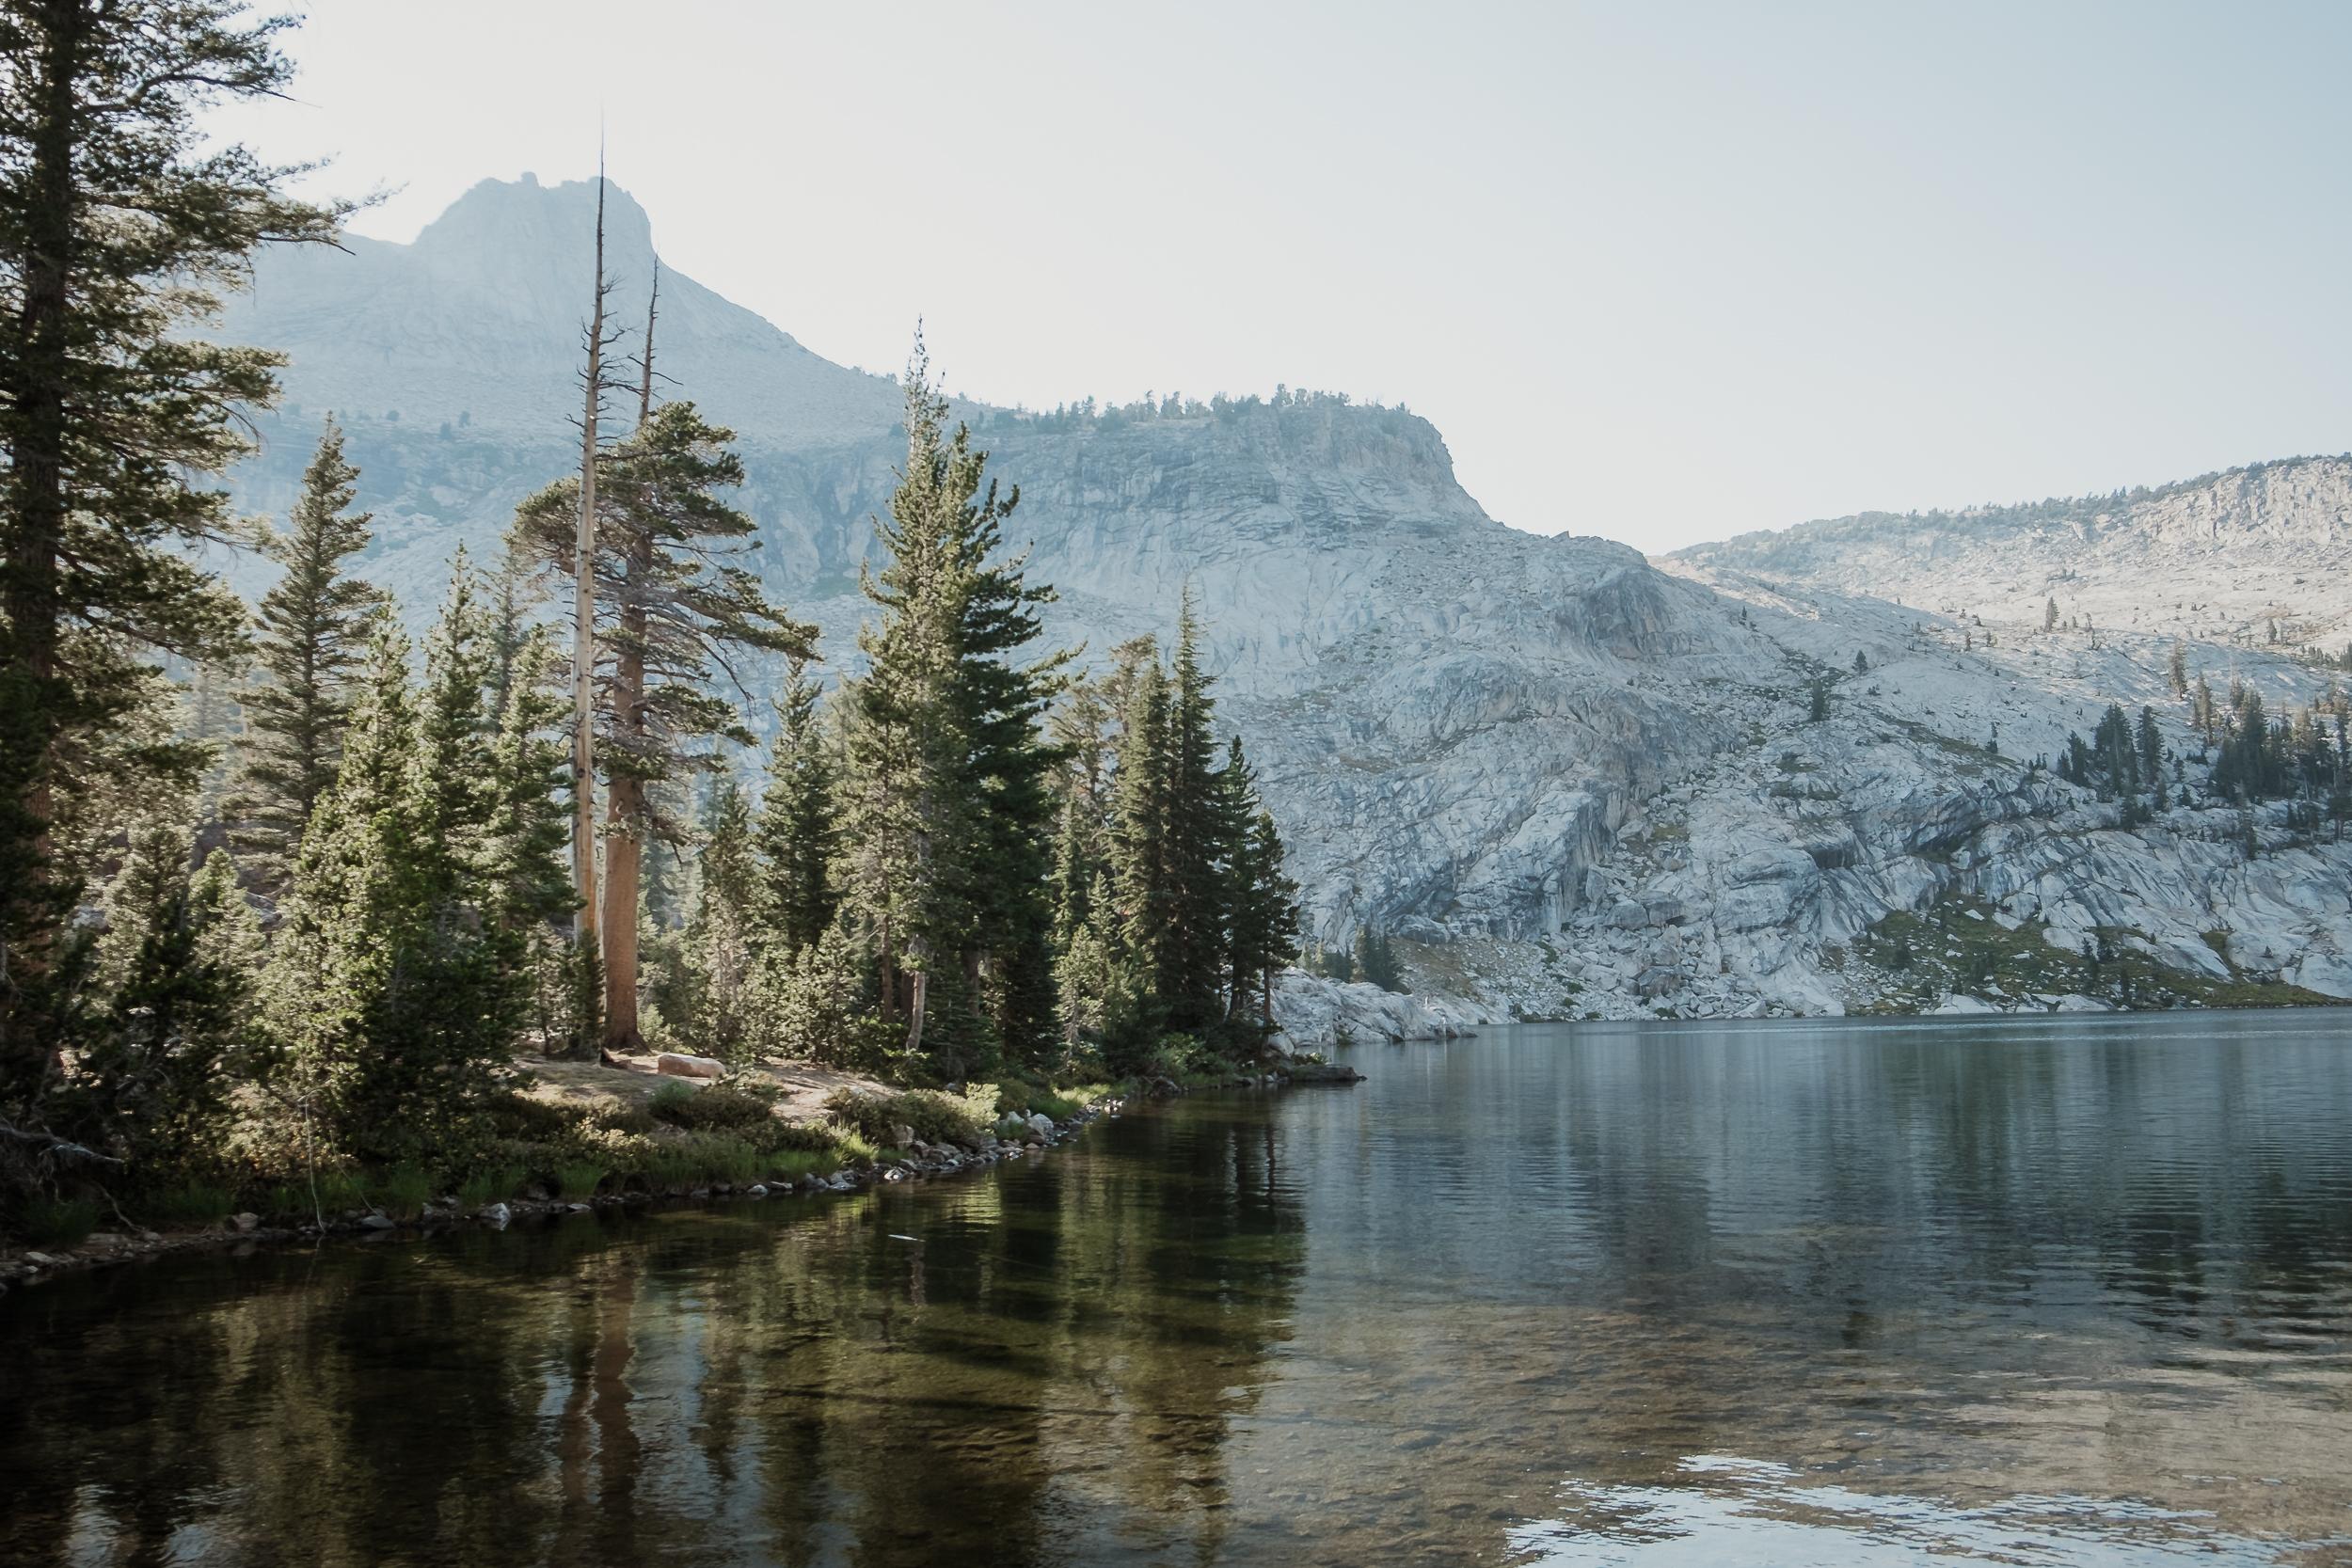 May Lake, Yosemite